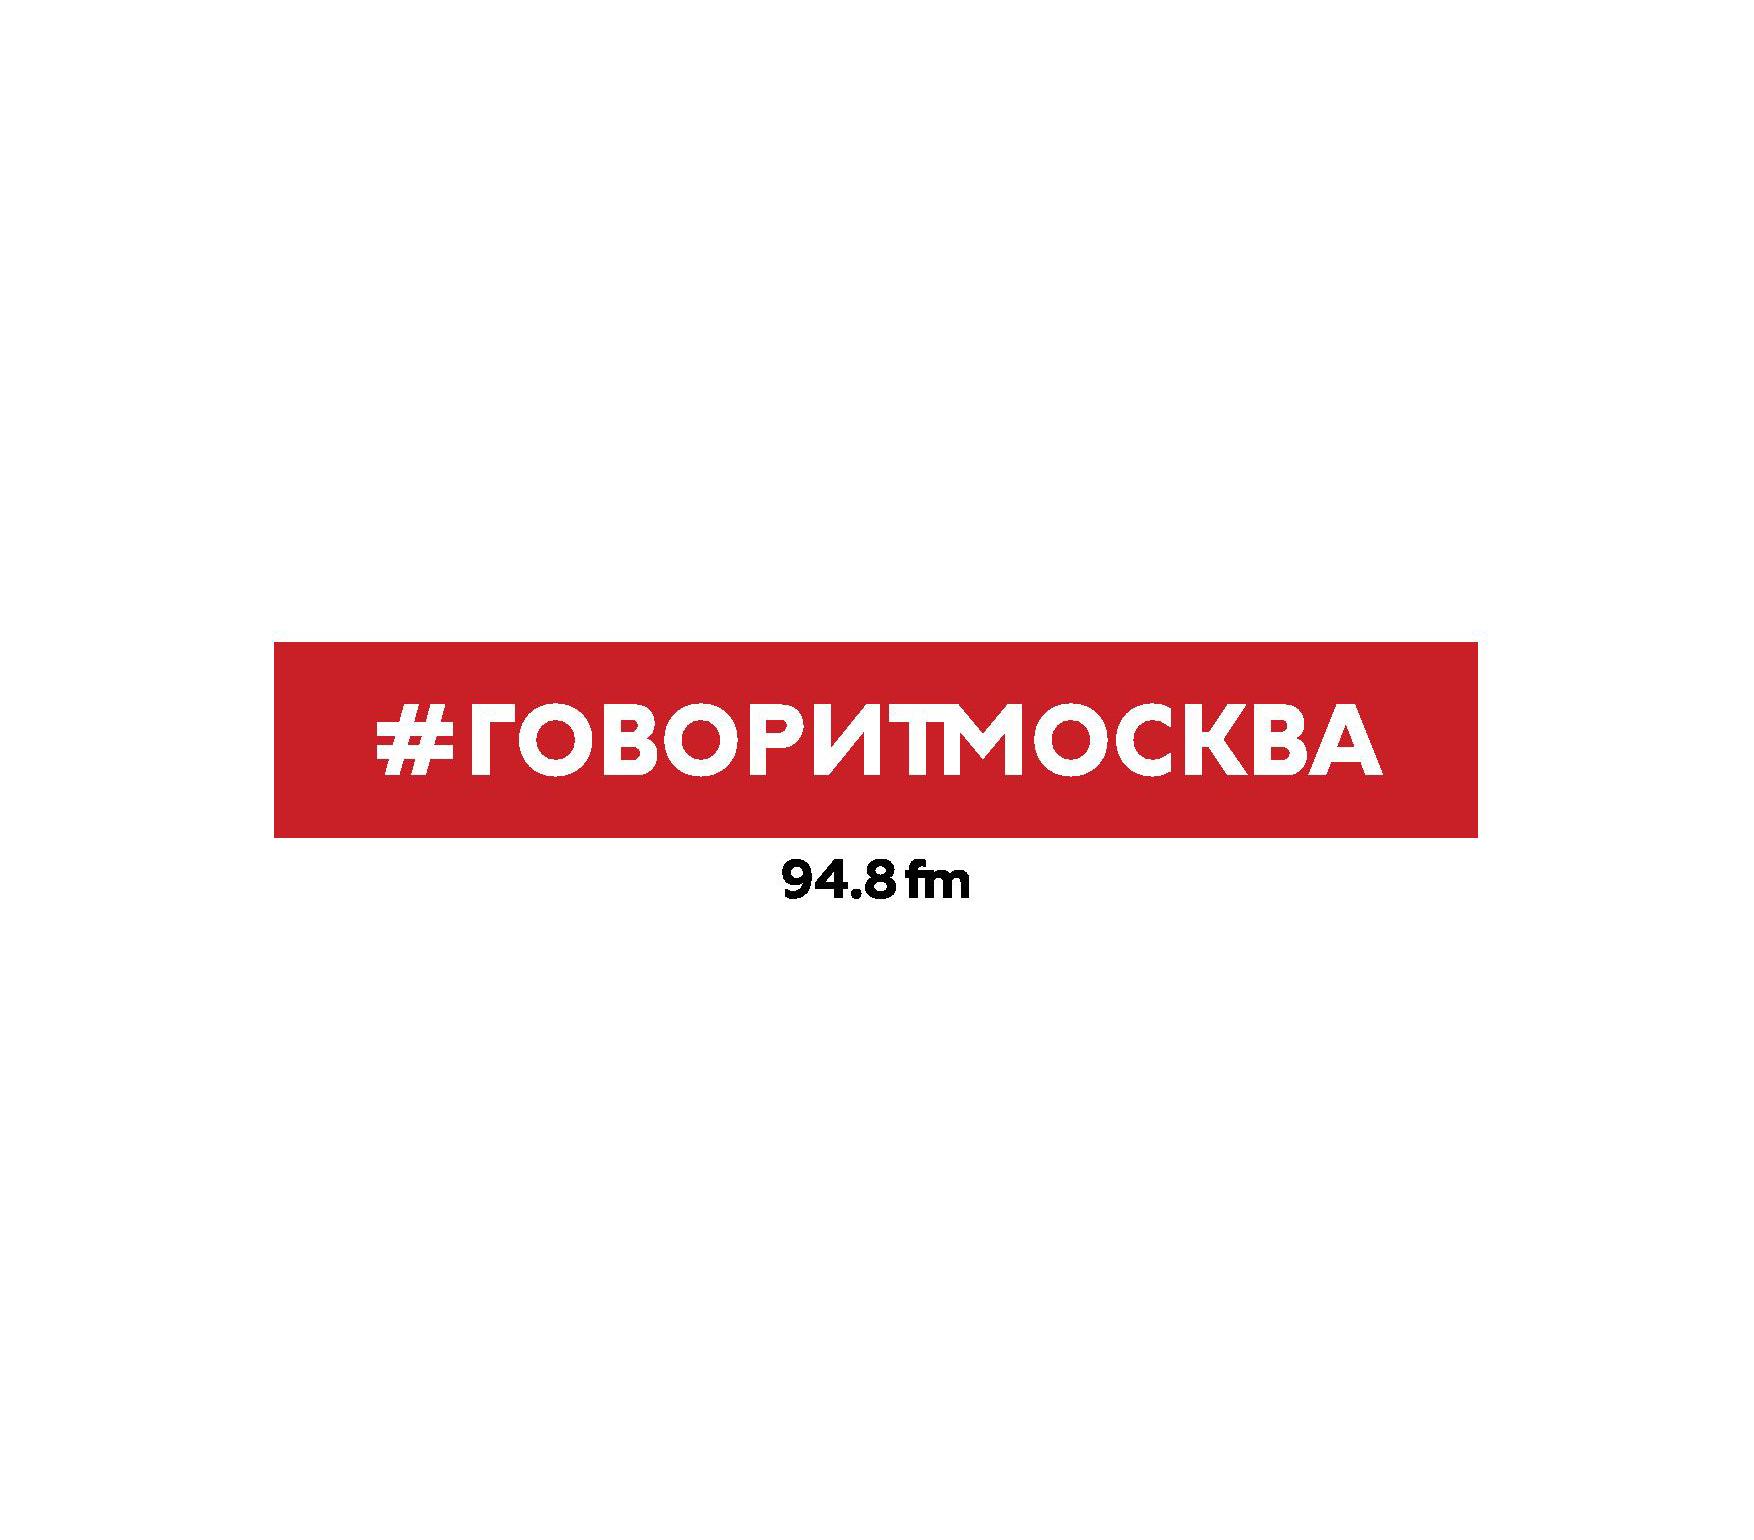 Макс Челноков 7 марта. Валерия